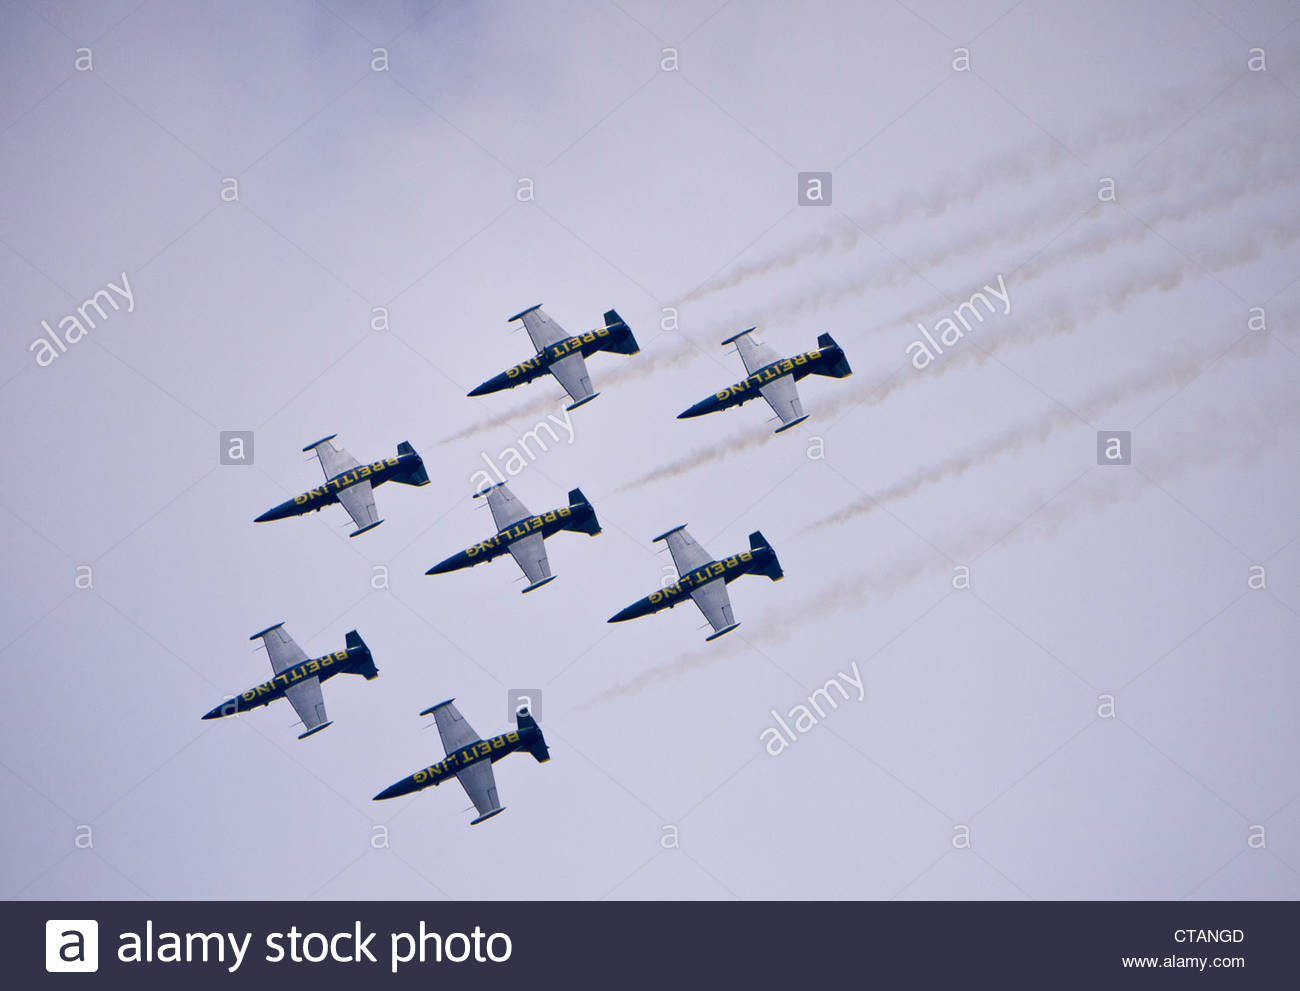 Breitling Jet Team inverted close Formation Farnborough 2012 - Stock Image